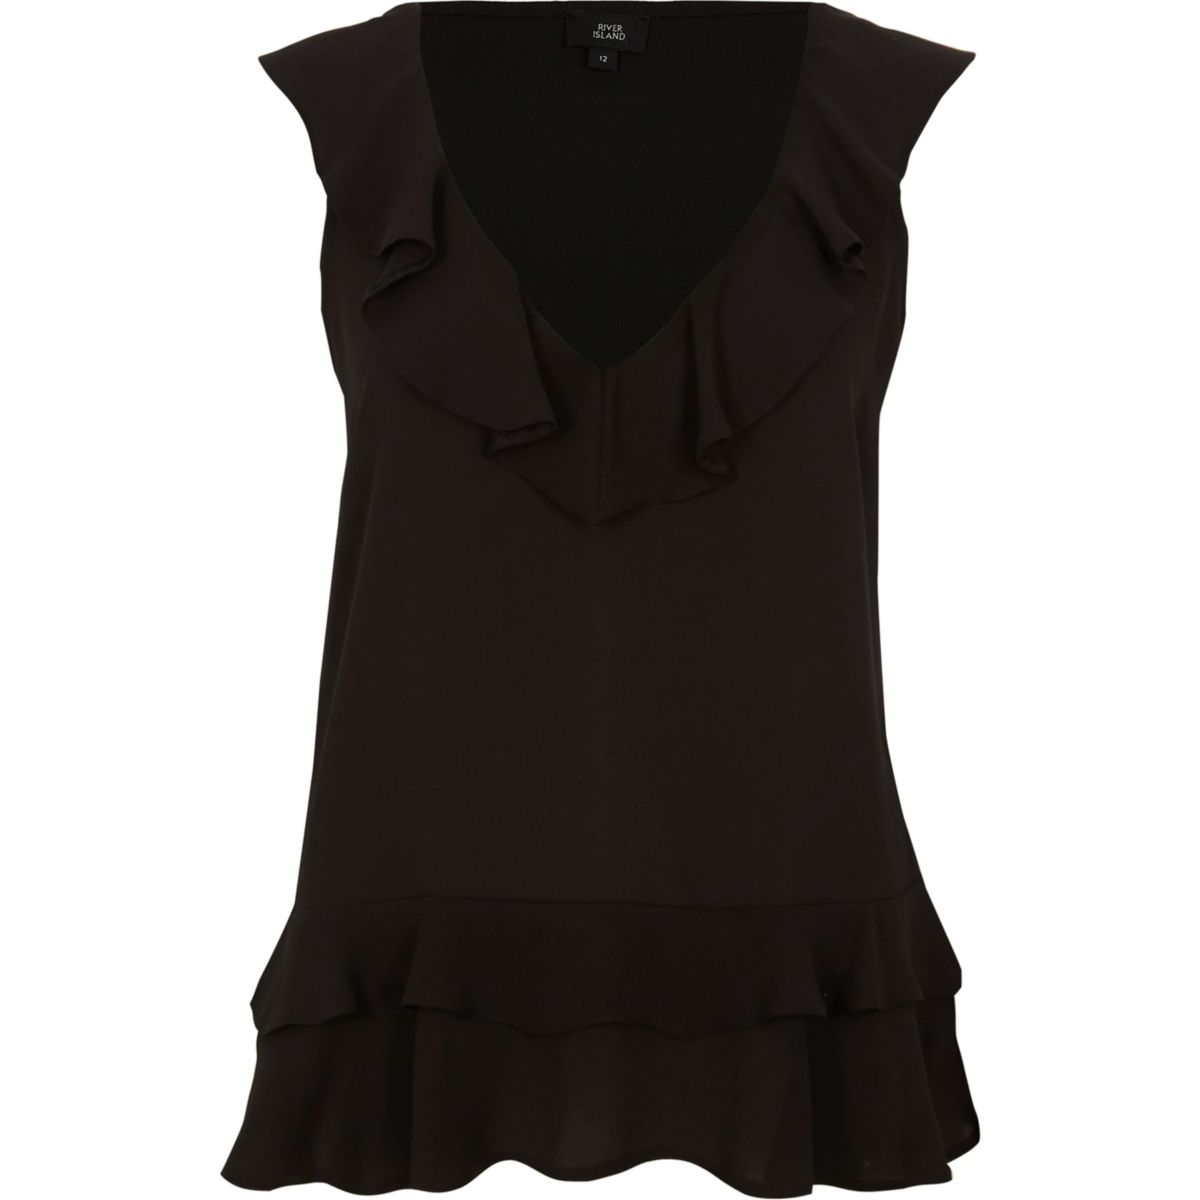 Black frill front V neck sleeveless top